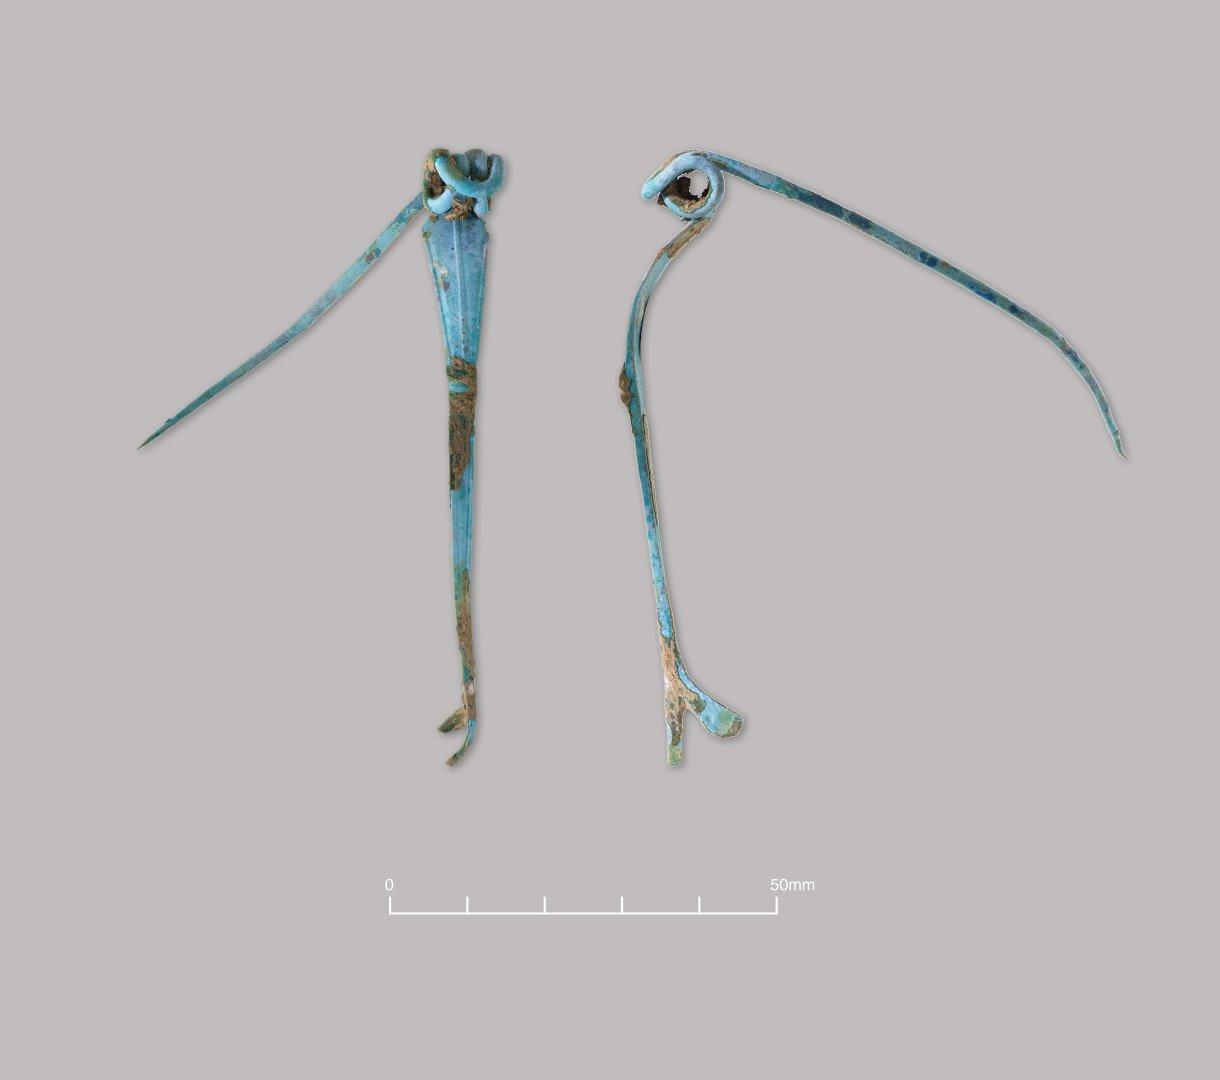 Copper Alloy La Tène III/'Boss-on-Bow' brooch. Late Iron Age (c. 100–50 BC)